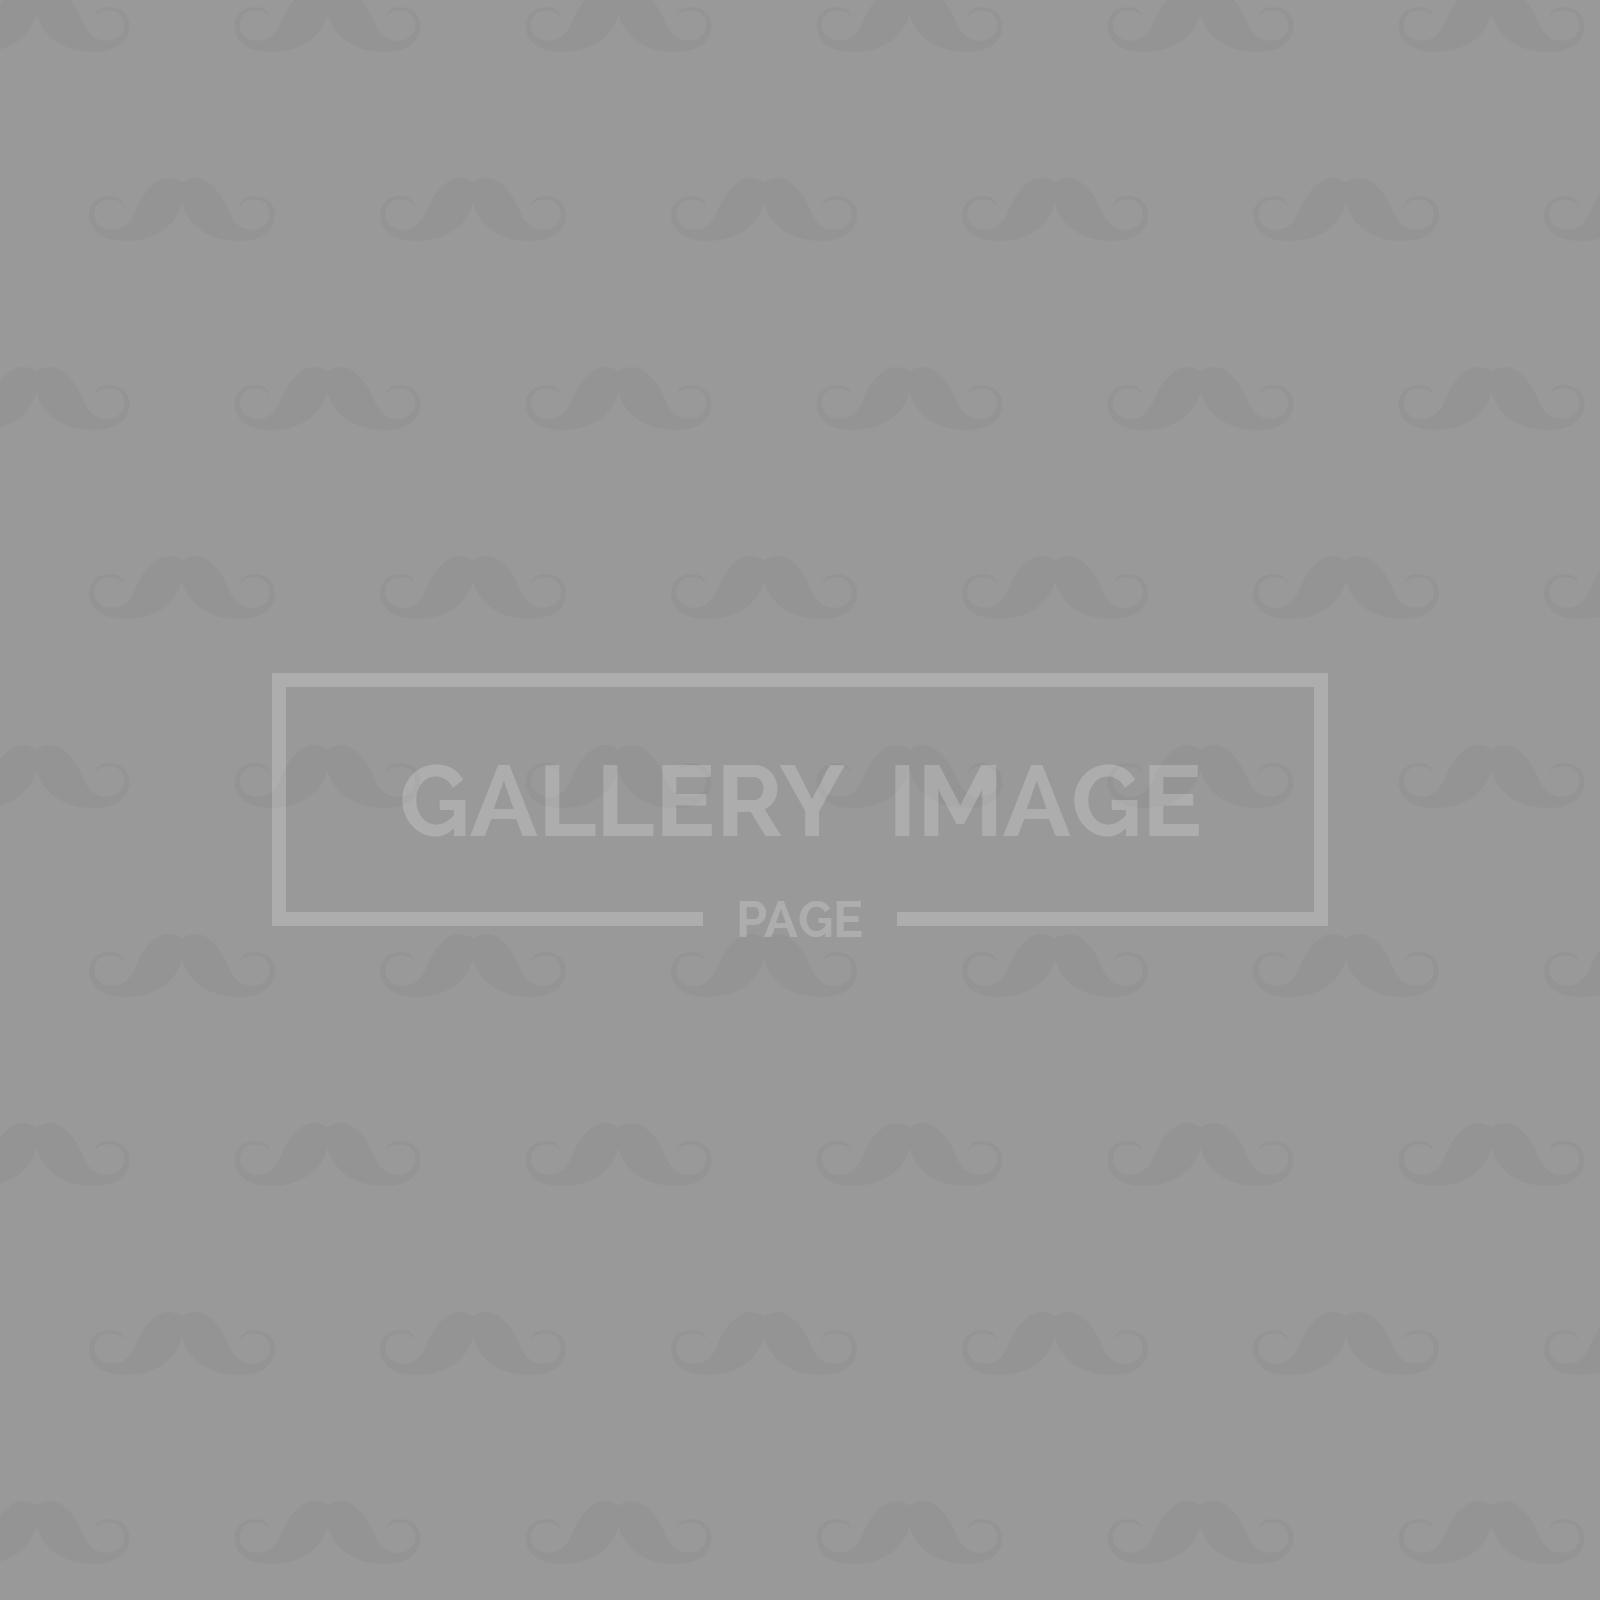 004_gallery